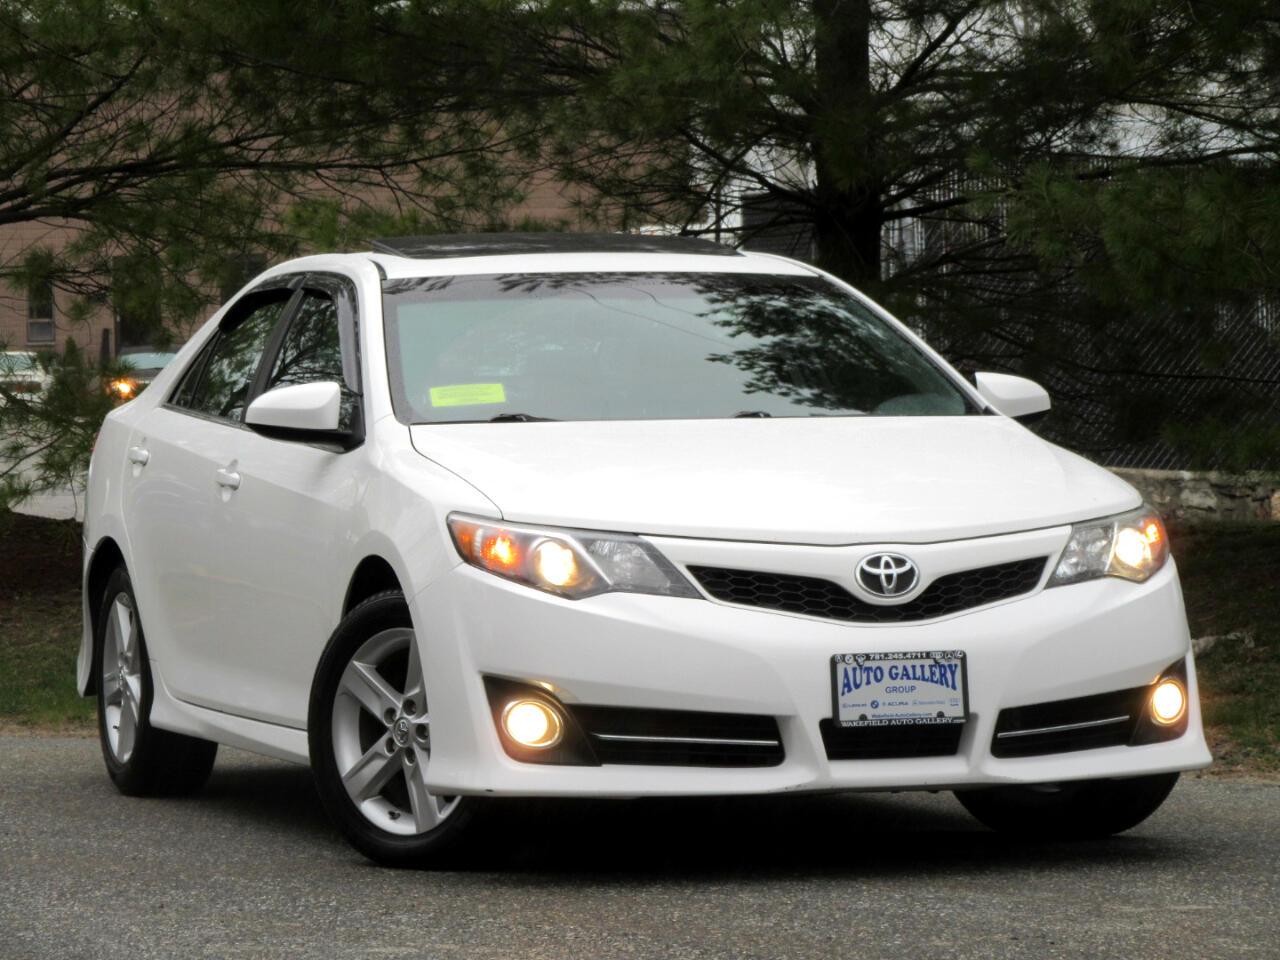 Toyota Camry 2014.5 4dr Sdn I4 Auto SE Sport (Natl) 2014